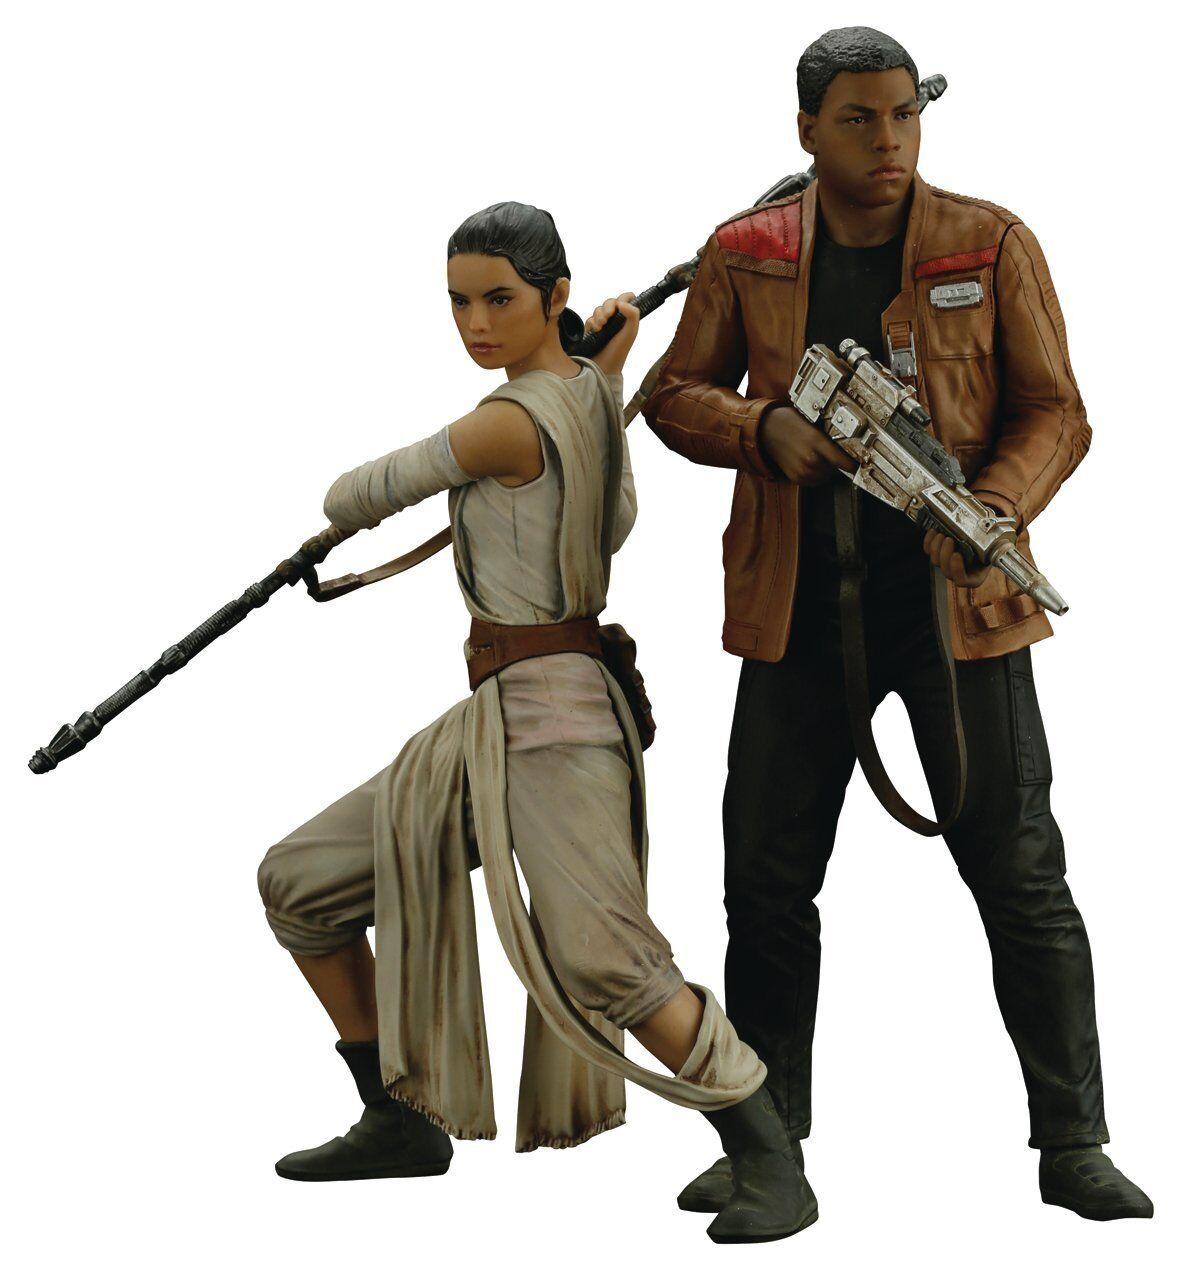 Star Wars 1/10 The Force Awakens Rey and Finn ArtFX+ Statue Kotobukiya